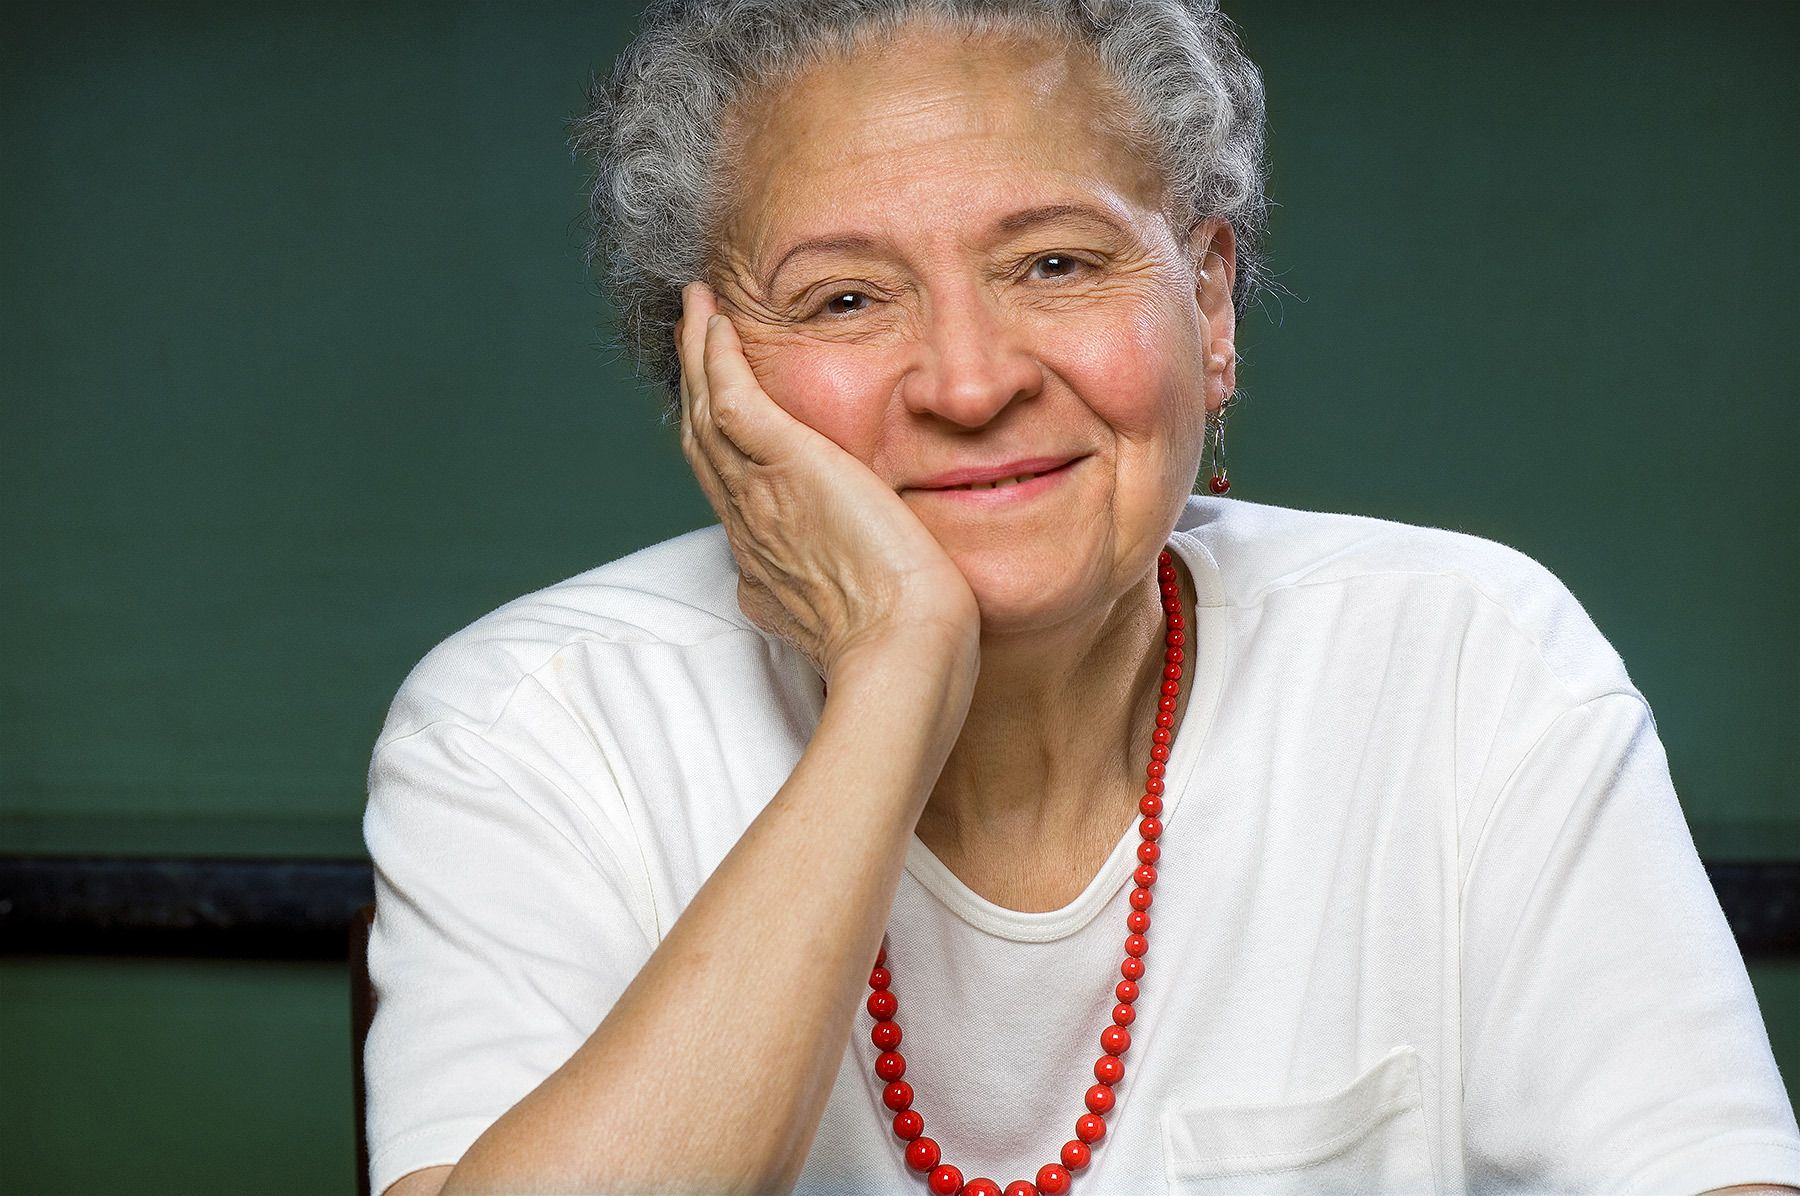 RHINA P. ESPAILLAT MUJER DOMINICANA EN N.Y. 2008